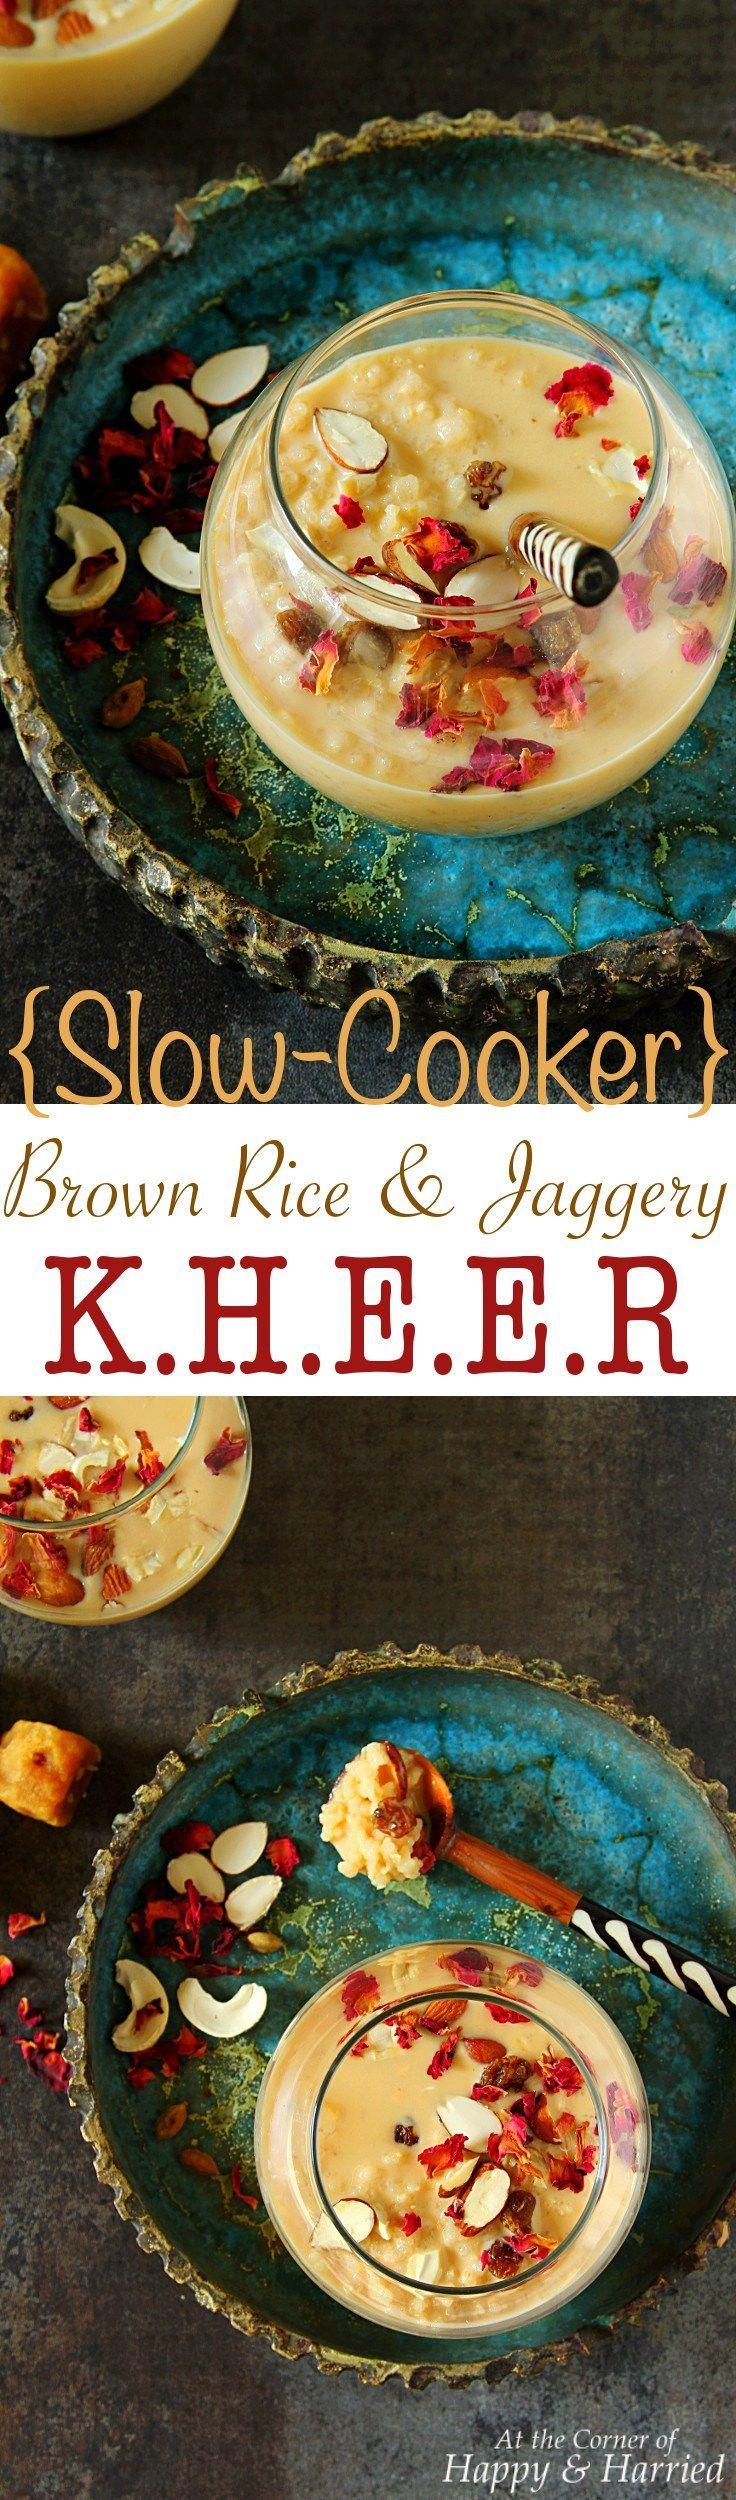 SLOW COOKER BROWN RICE JAGGERY KHEER - HAPPY&HARRIED. #happyandharried #kheer #rice #pudding #slow #cooker #Indian #dessert #recipe